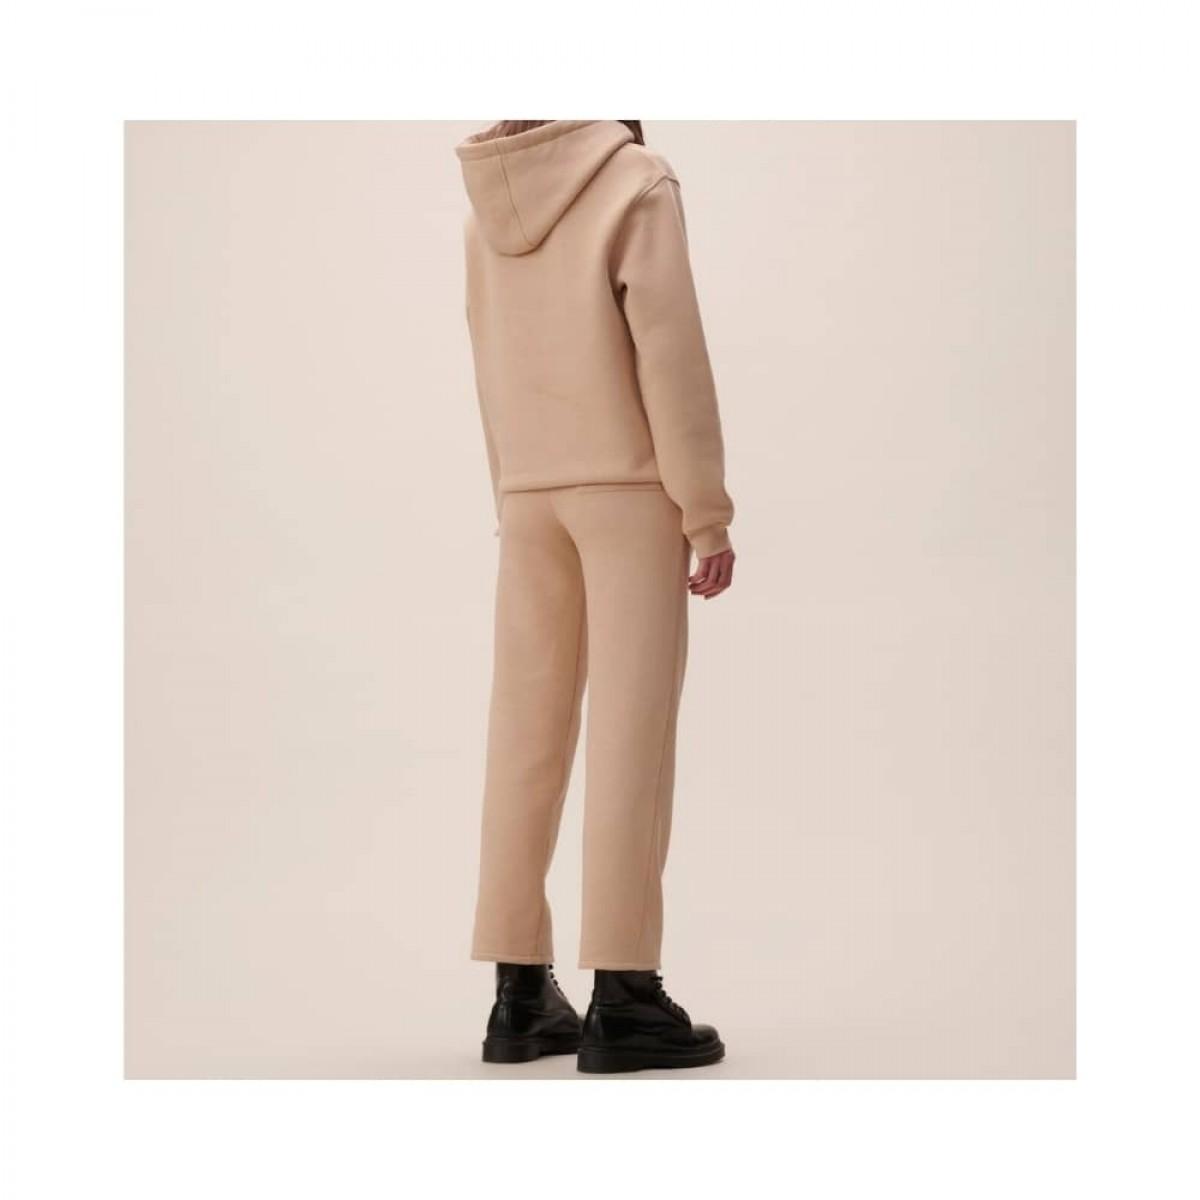 yetka sweat bukser - nomad camel - model bagfra